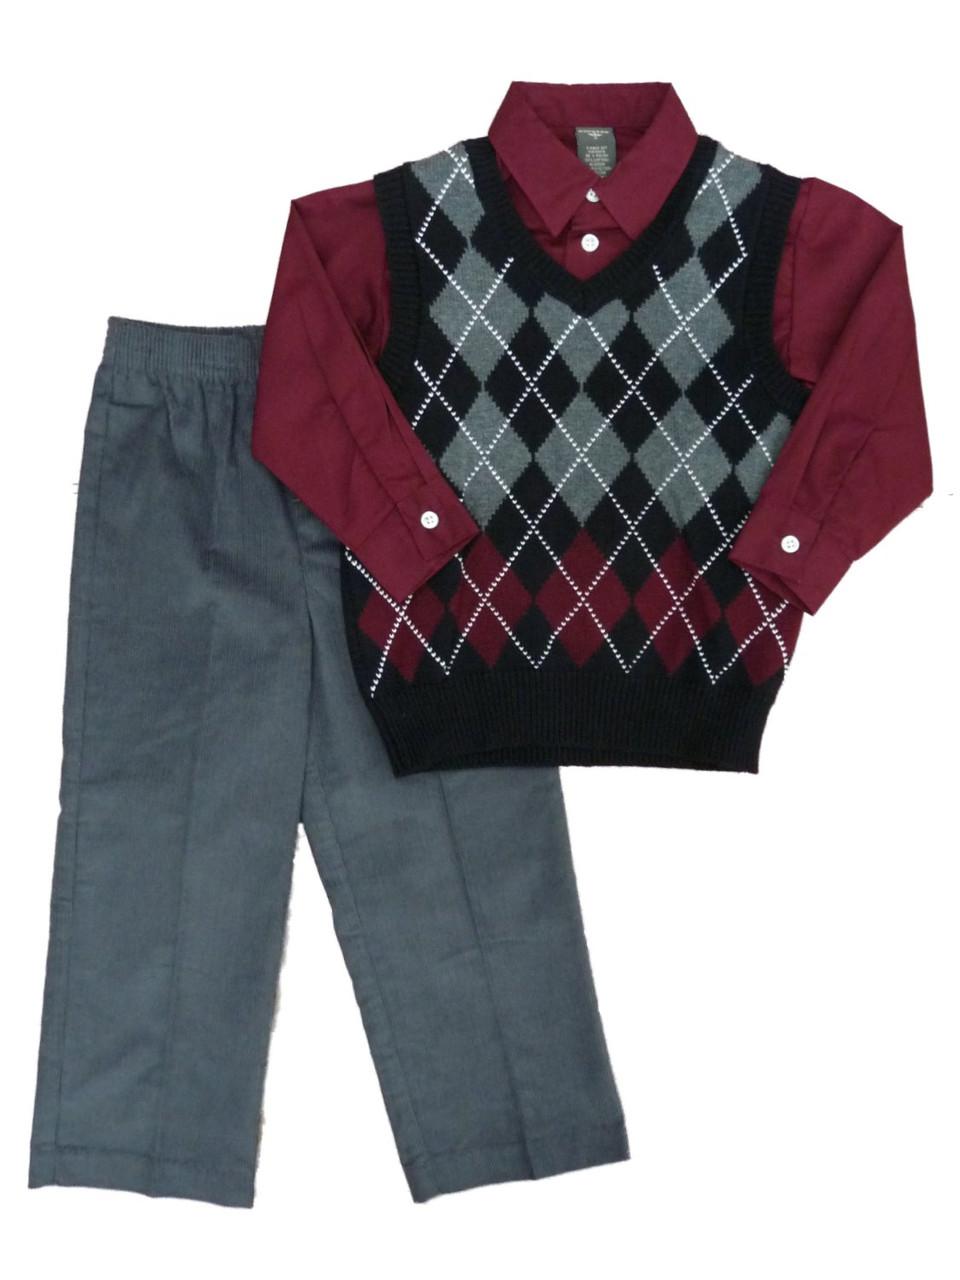 pants and shirt, Toddler Boys 3 Piece Set Dockers Sweater vest